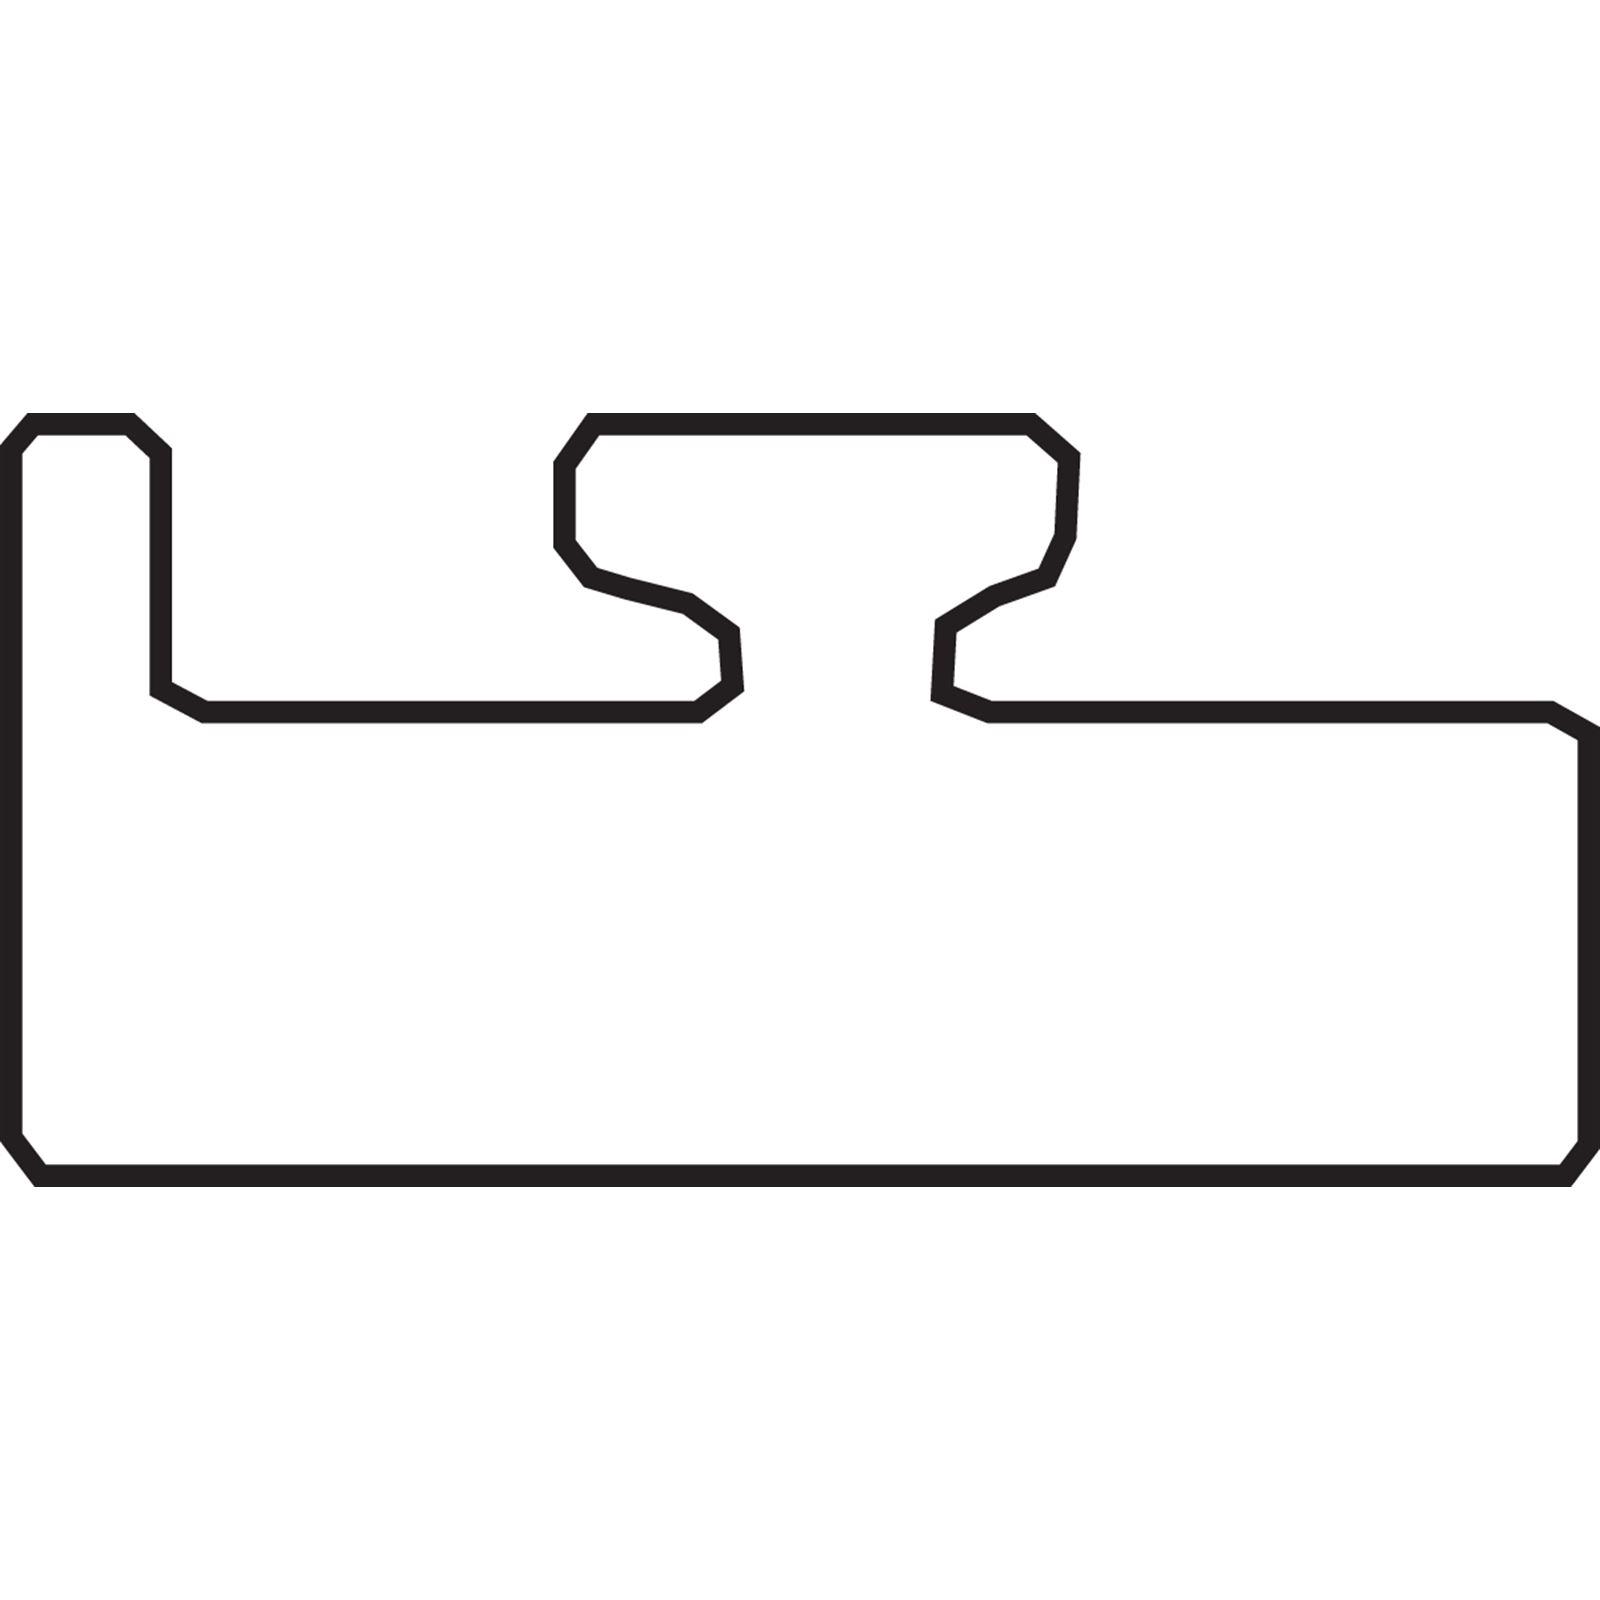 "Garland Black Replacement Slide - Profile 15 - Graphite - Length 55.00"" - Polaris"